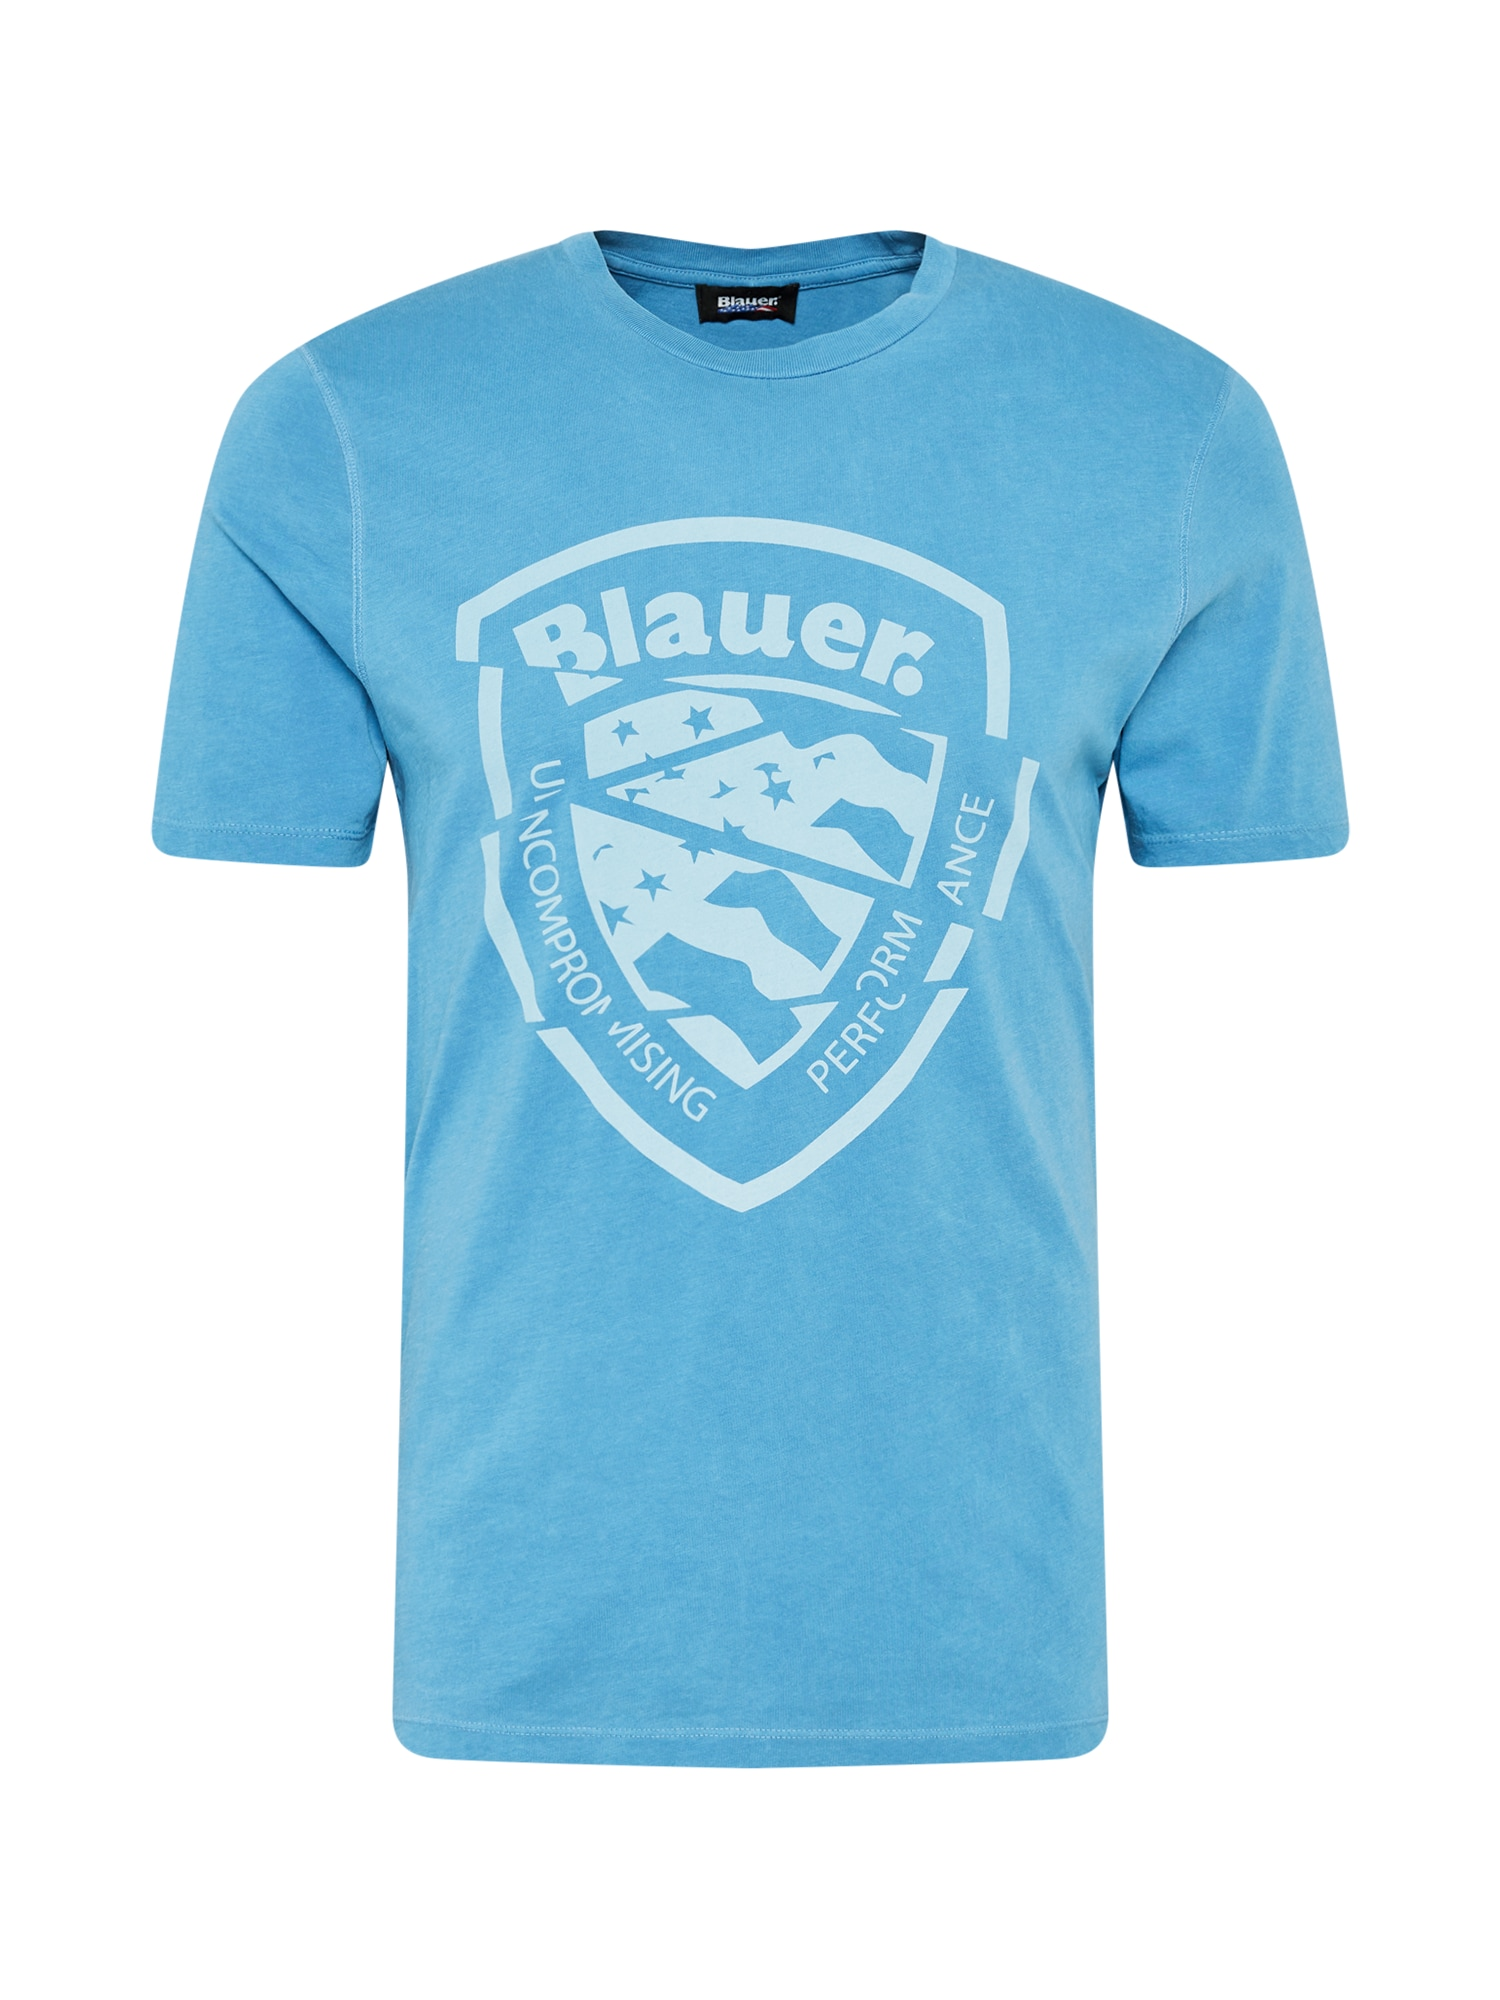 "Blauer.USA Marškinėliai sodri mėlyna (""karališka"") / azuro spalva"